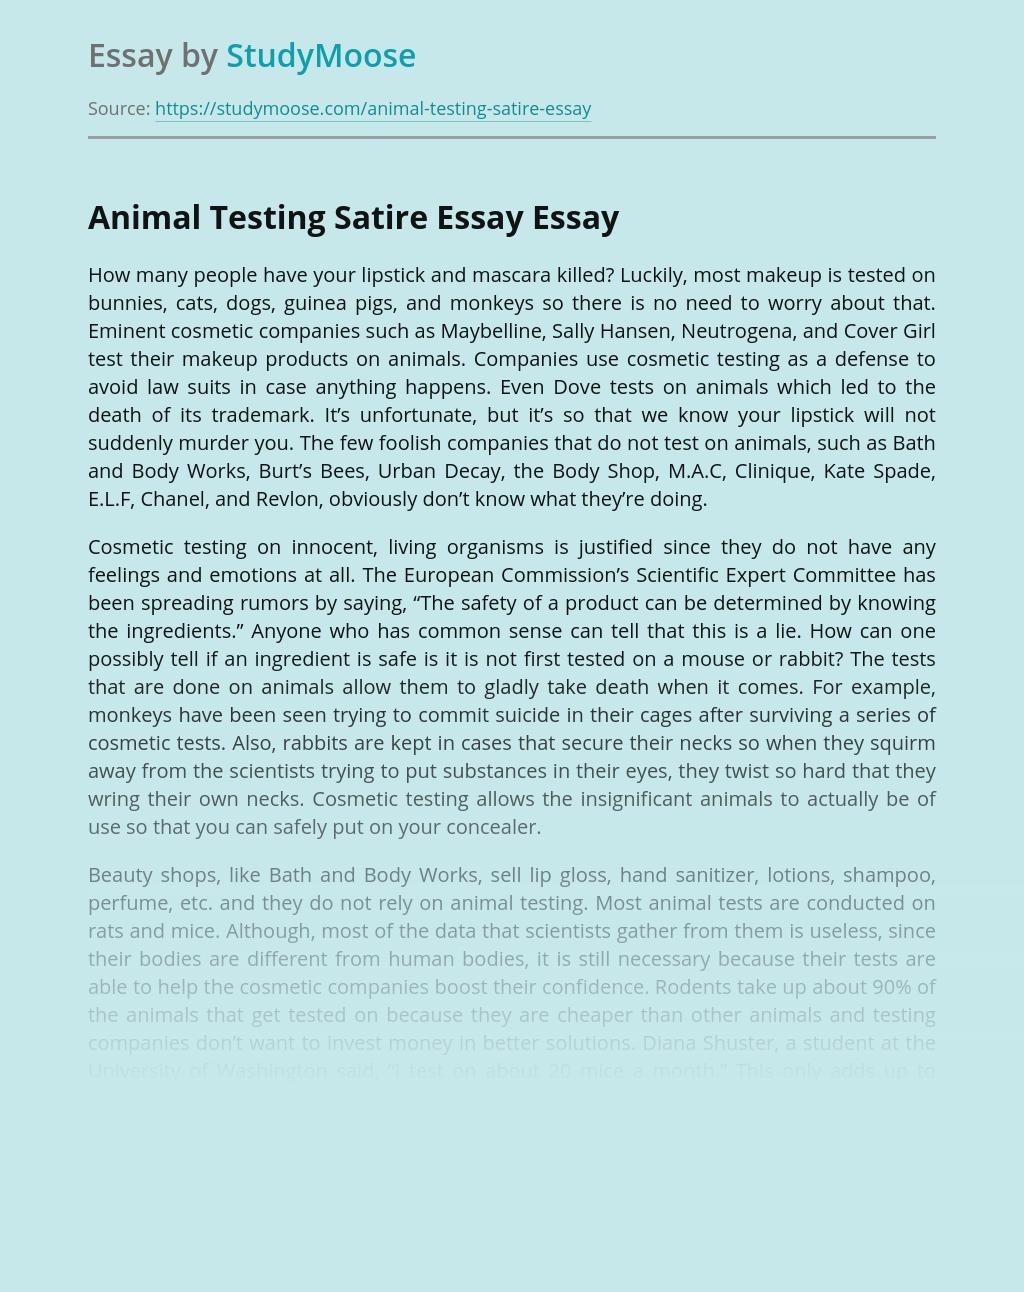 Animal Testing Satire Essay